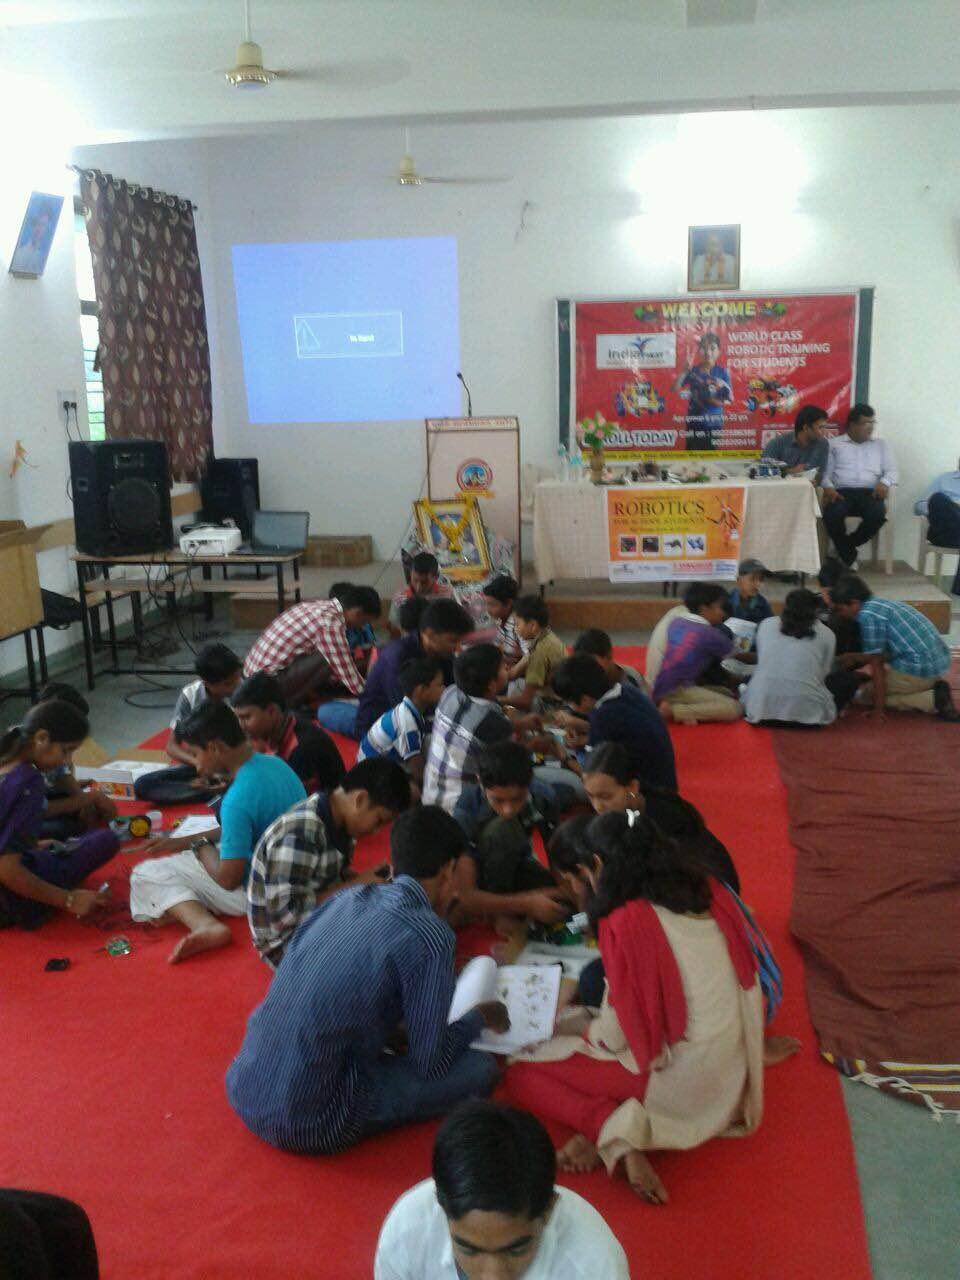 Robotics Training for School Students